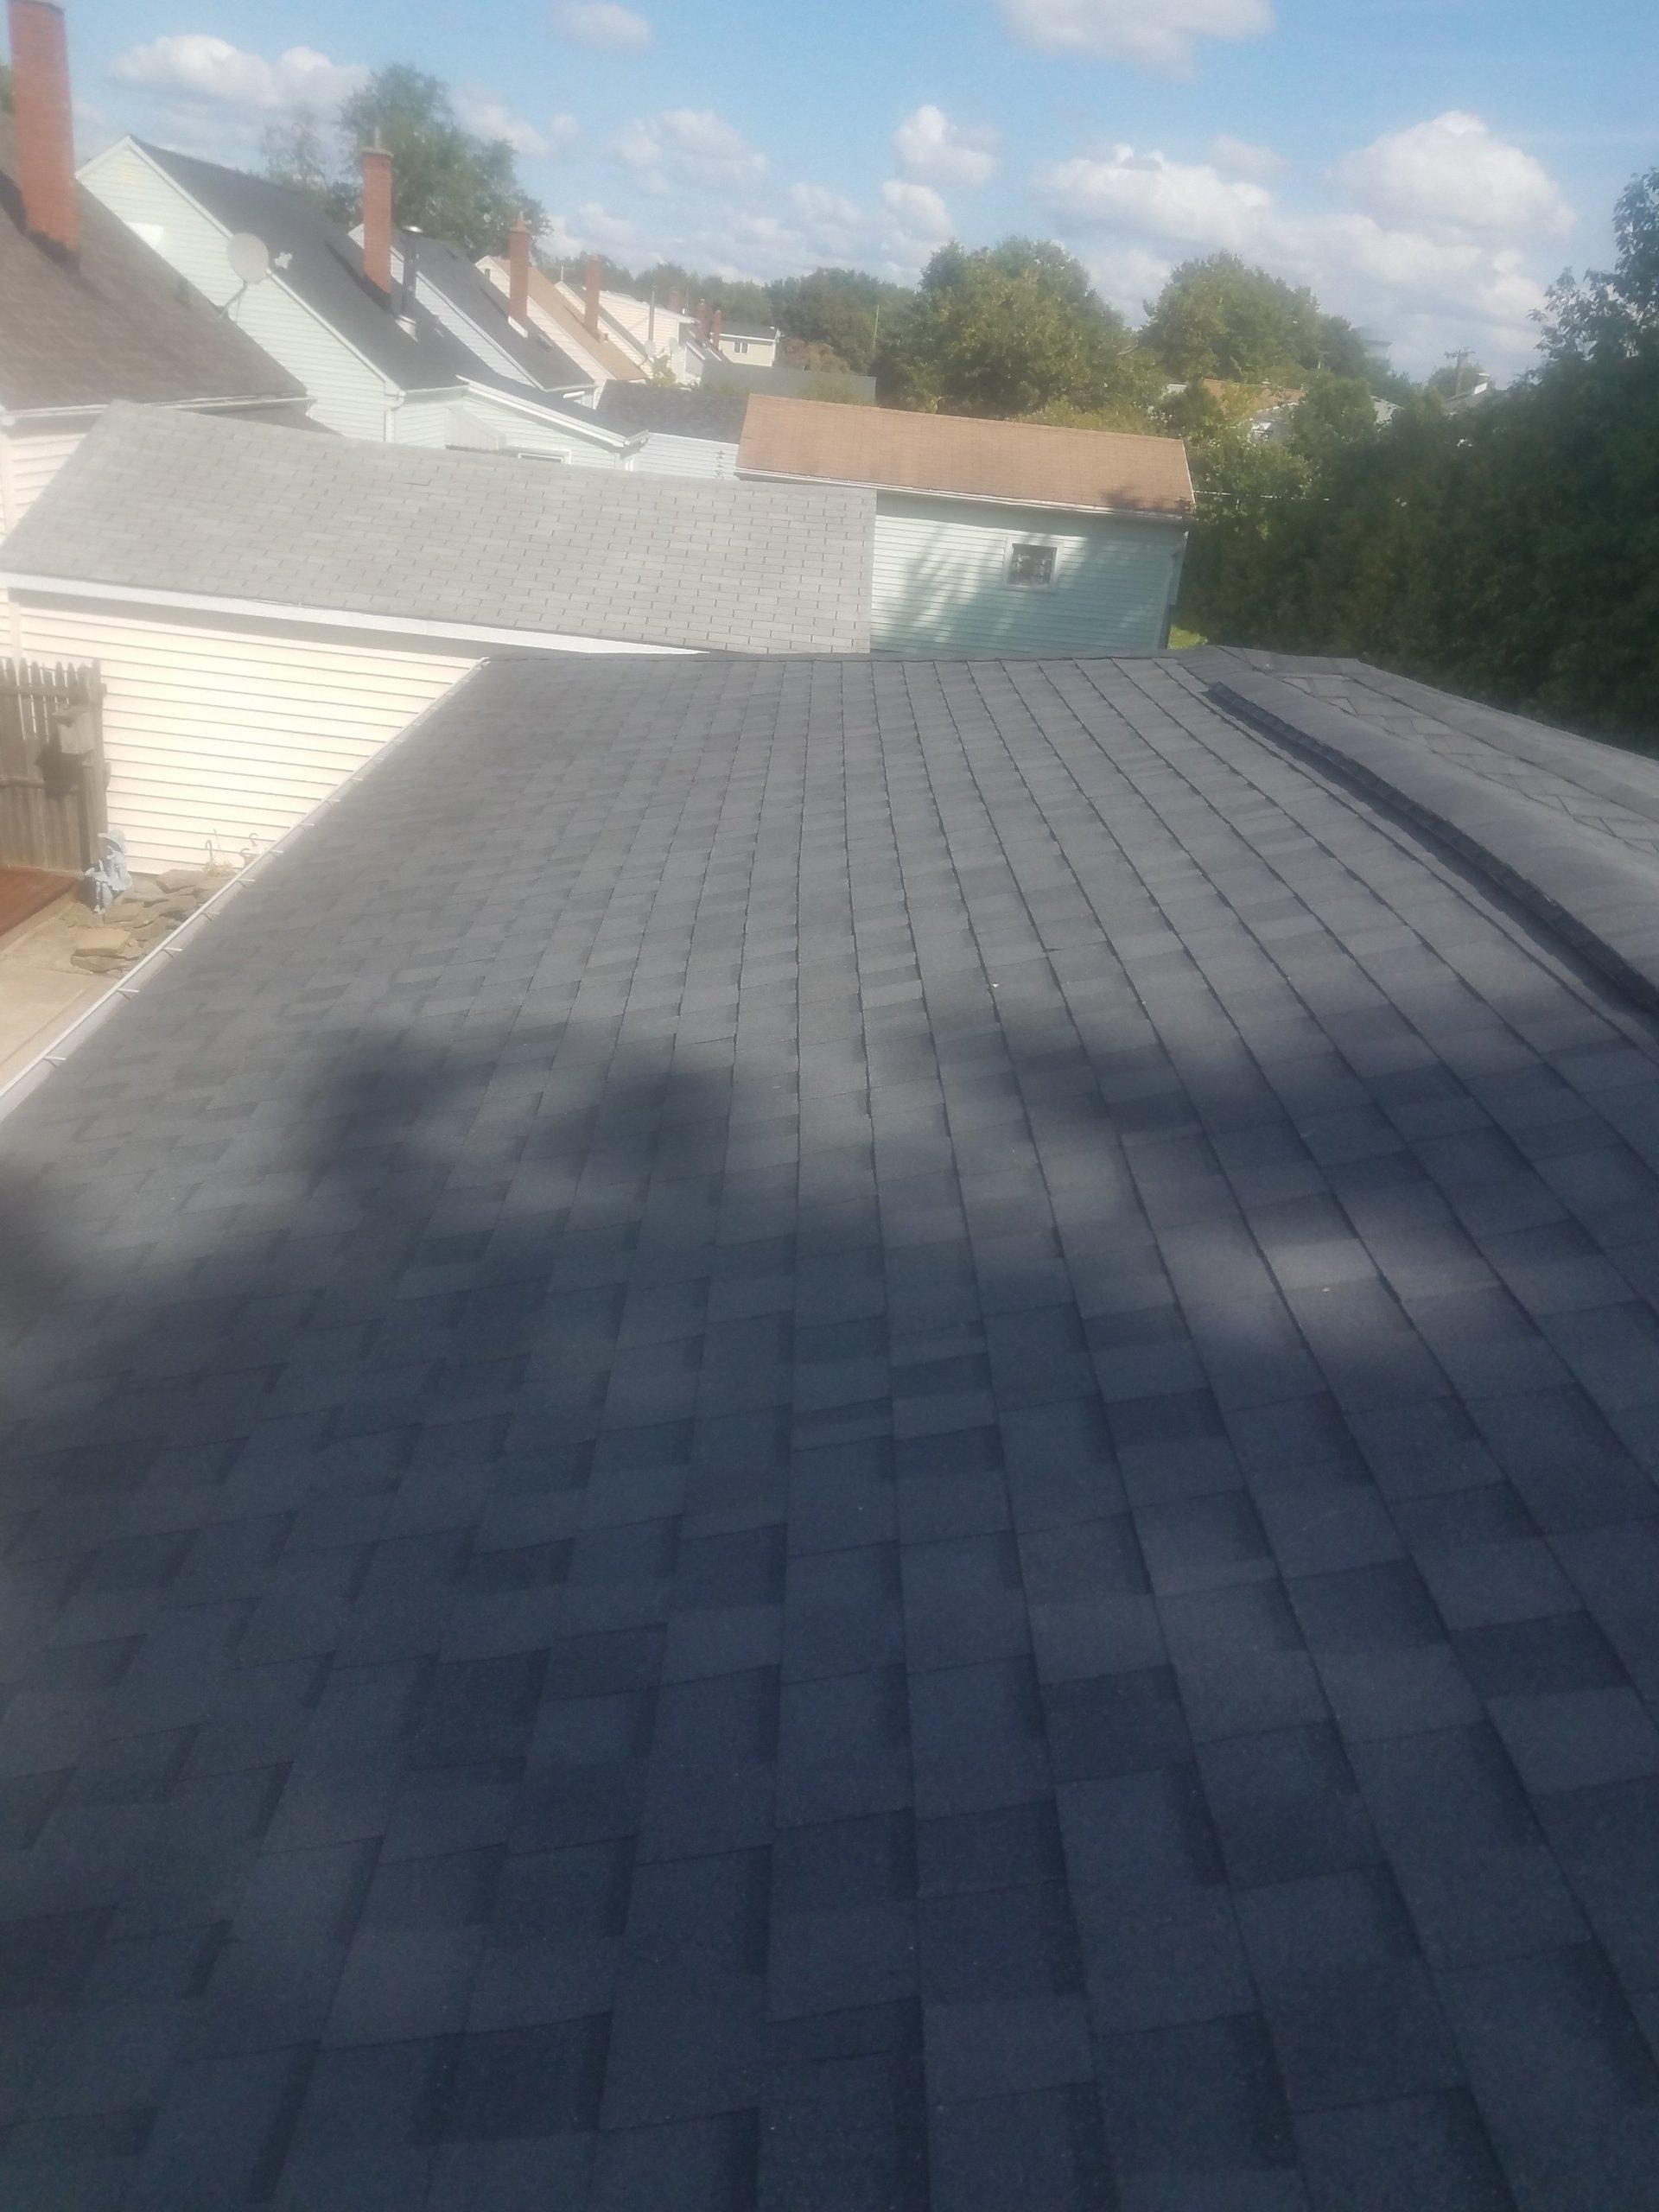 Garage Roof Tear Off & Installation